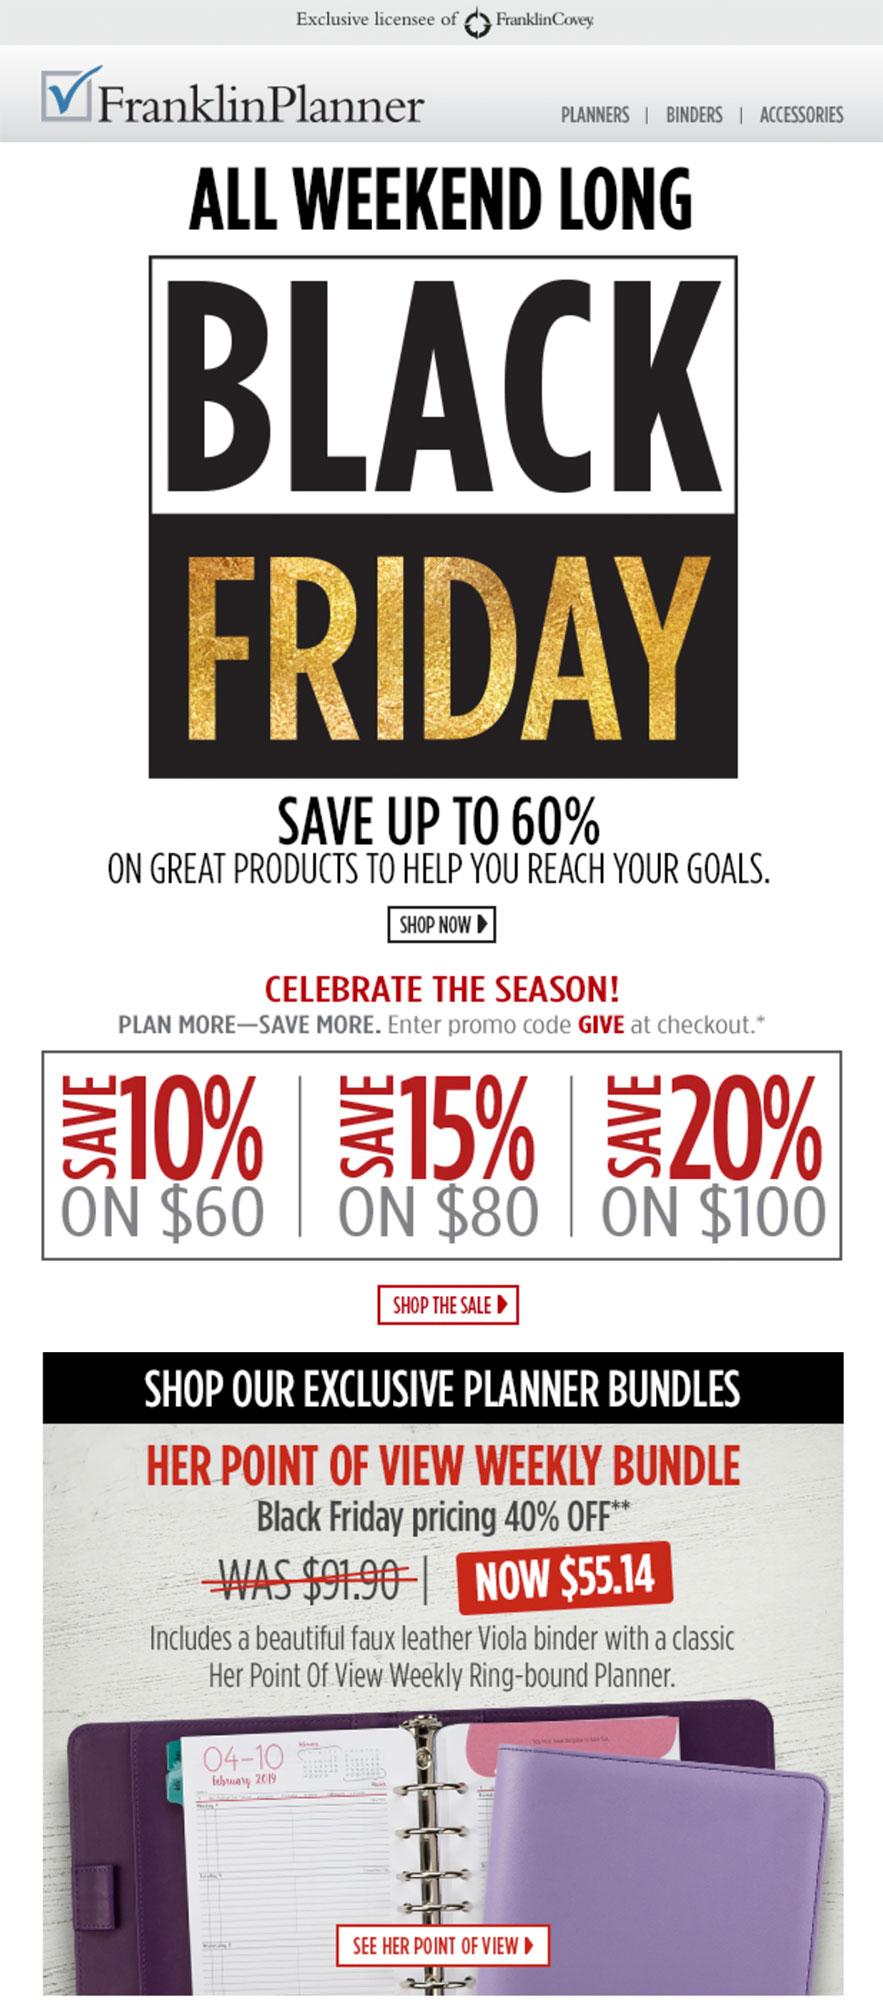 FranklinPlanner's all weekend long BFCM sale.